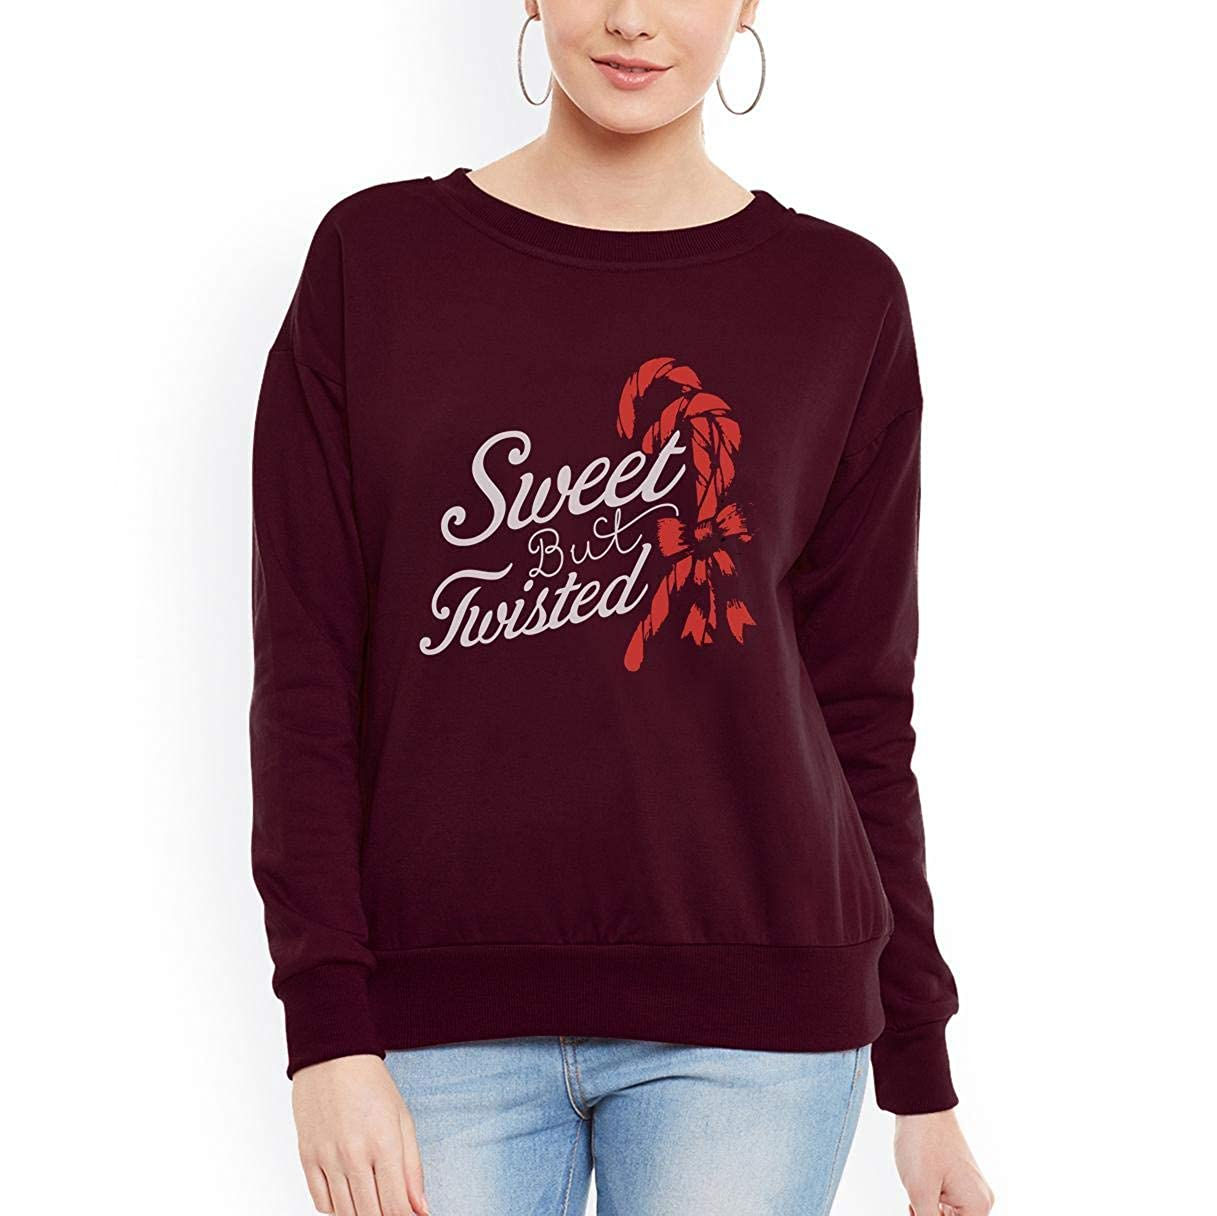 tee Sweet But Twisted Funny Candy Cane Christmas Women Sweatshirt